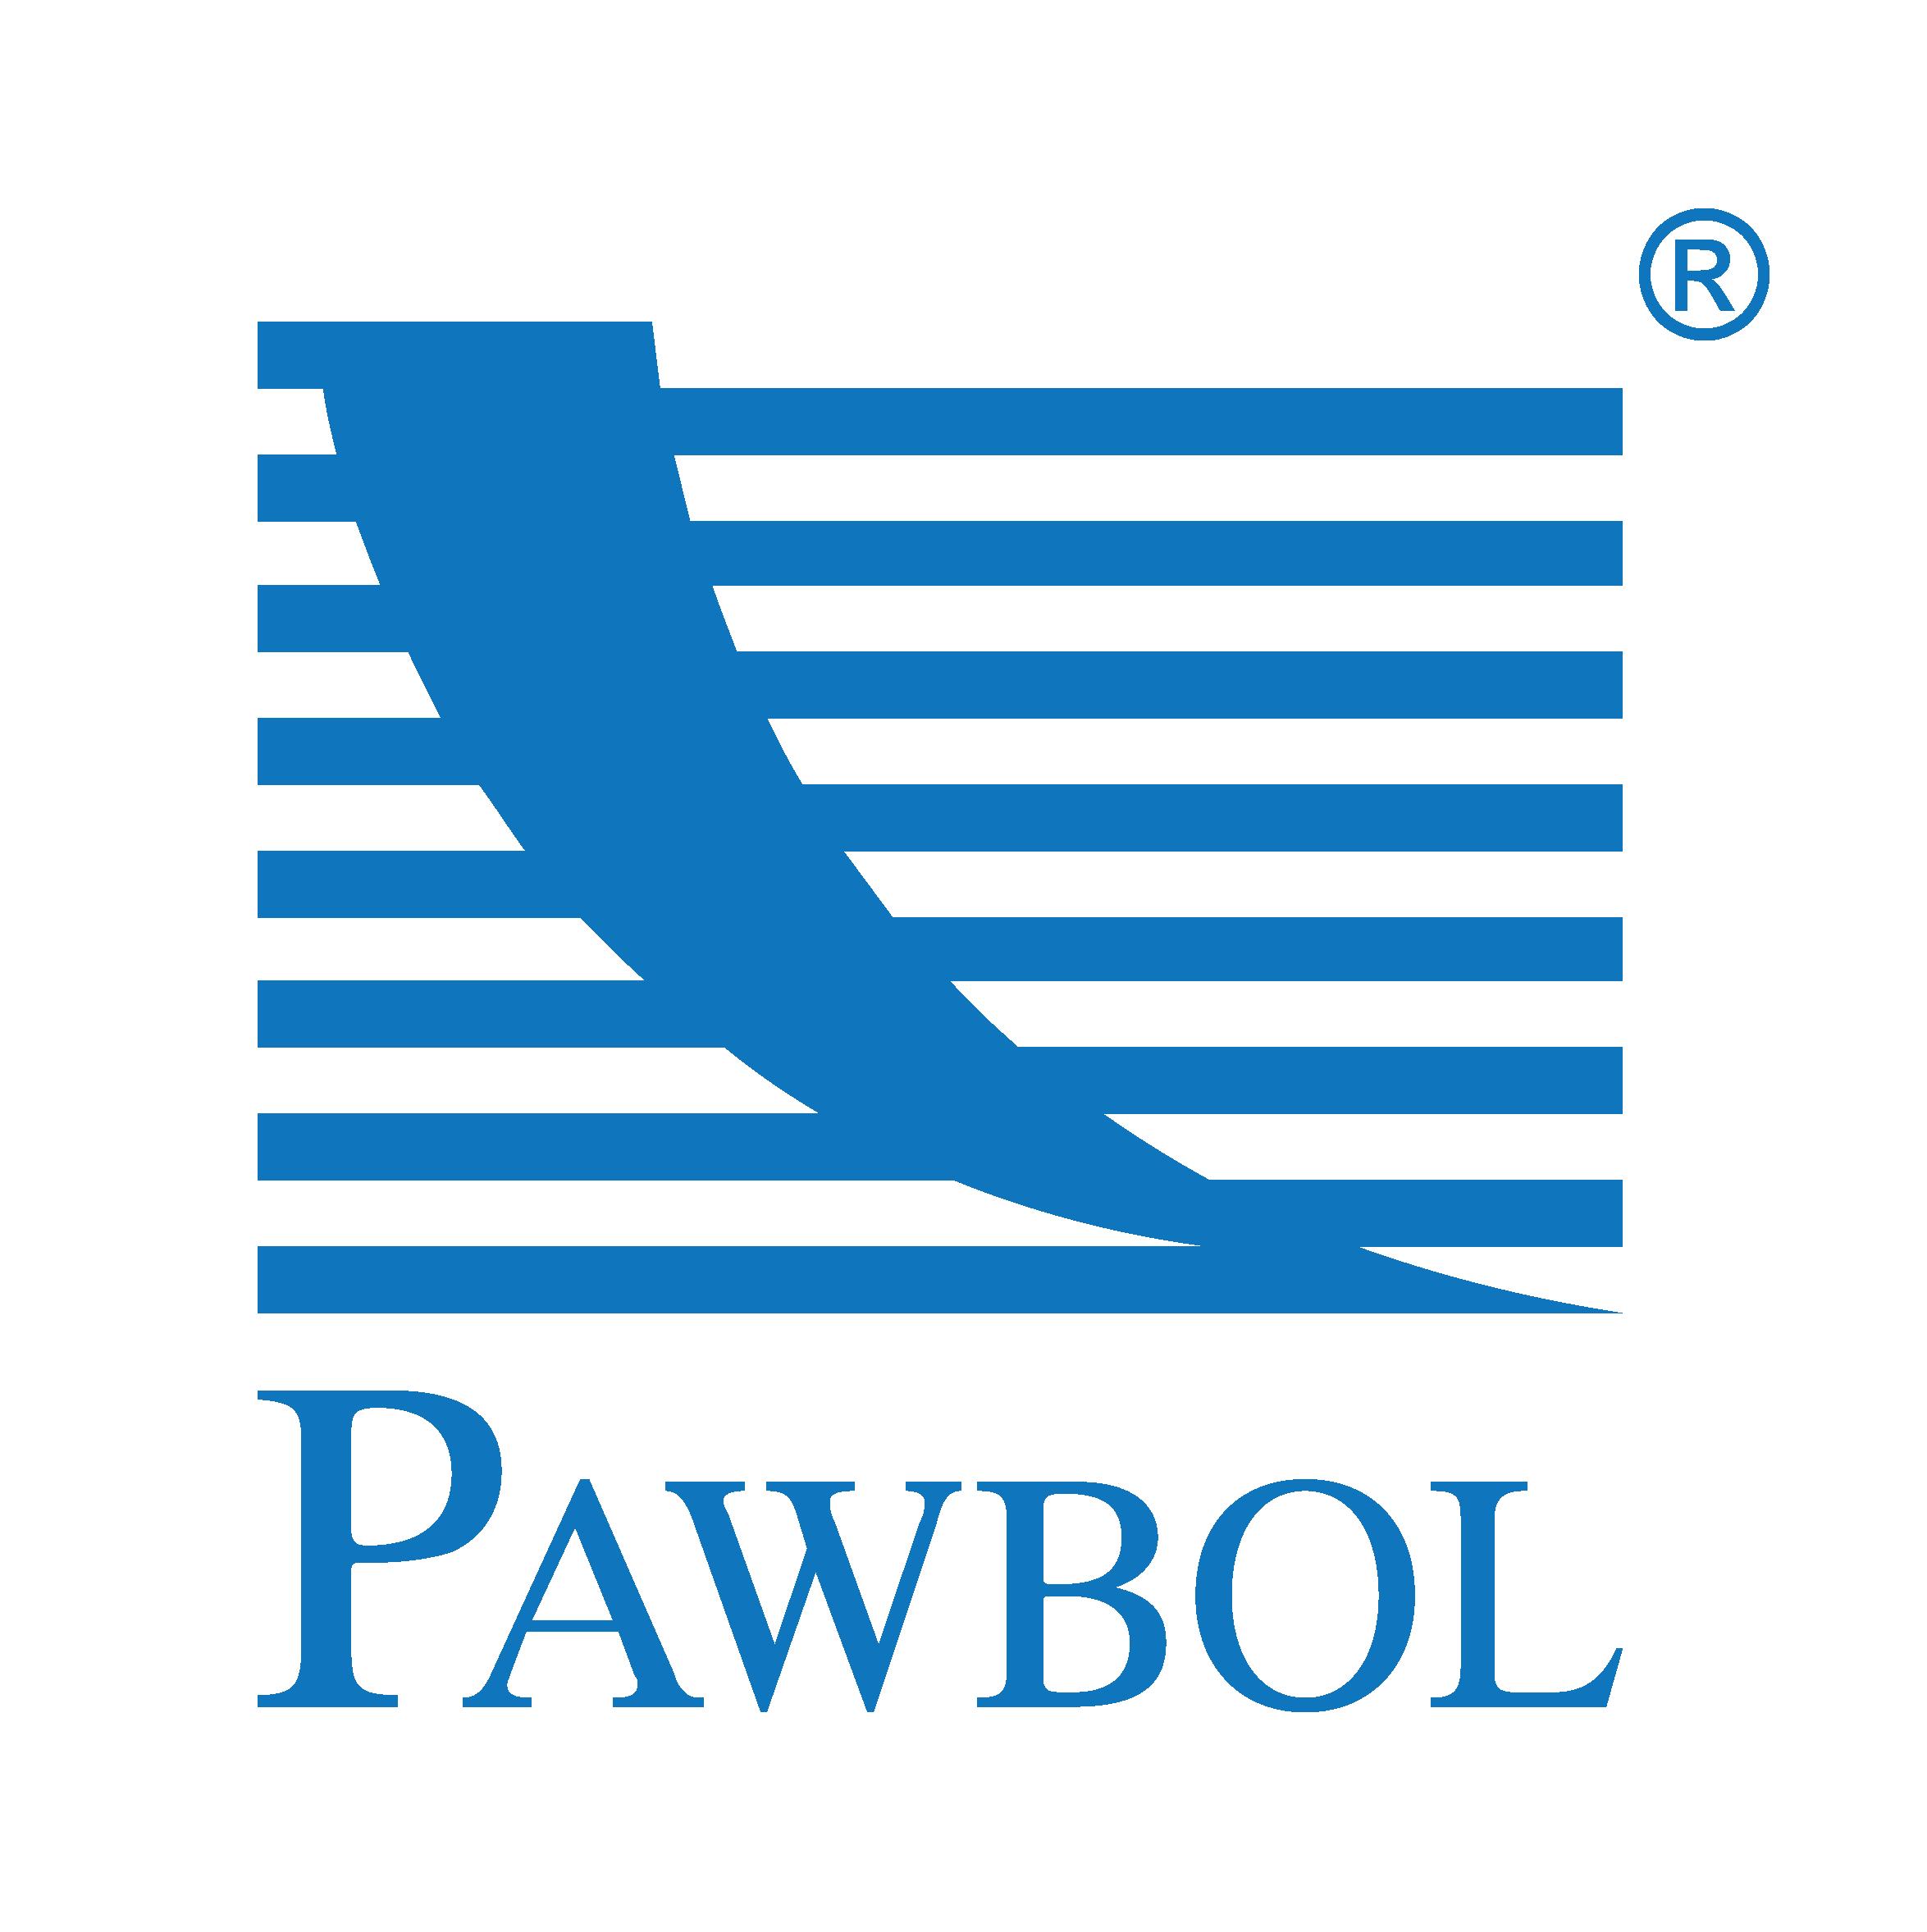 pawbol